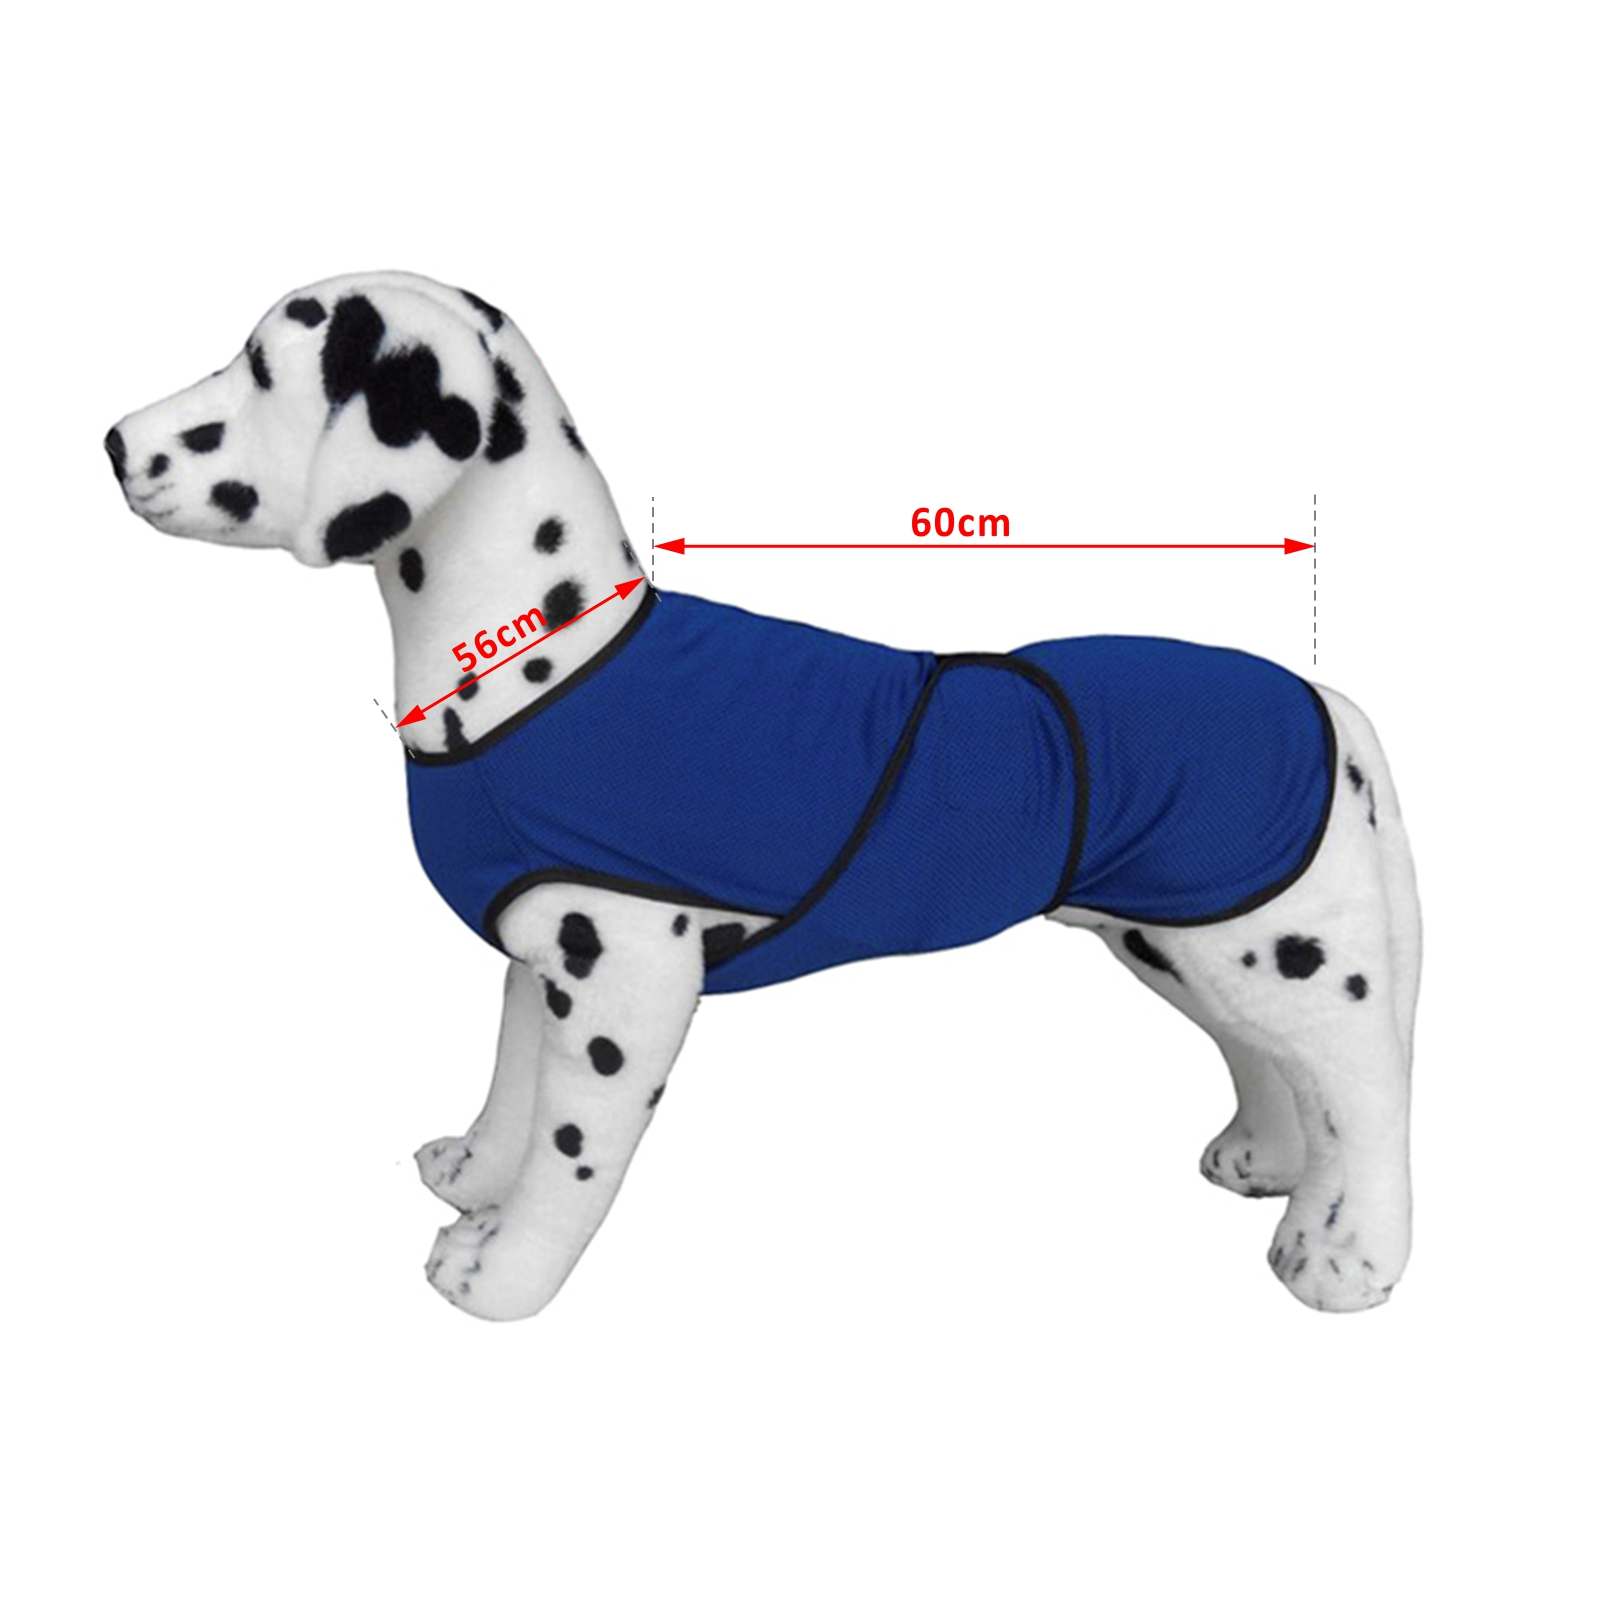 Chaqueta-Chaleco-de-Refrigeracion-Perro-Ropa-de-Verano-Chaleco-para-Mascotas miniatura 8